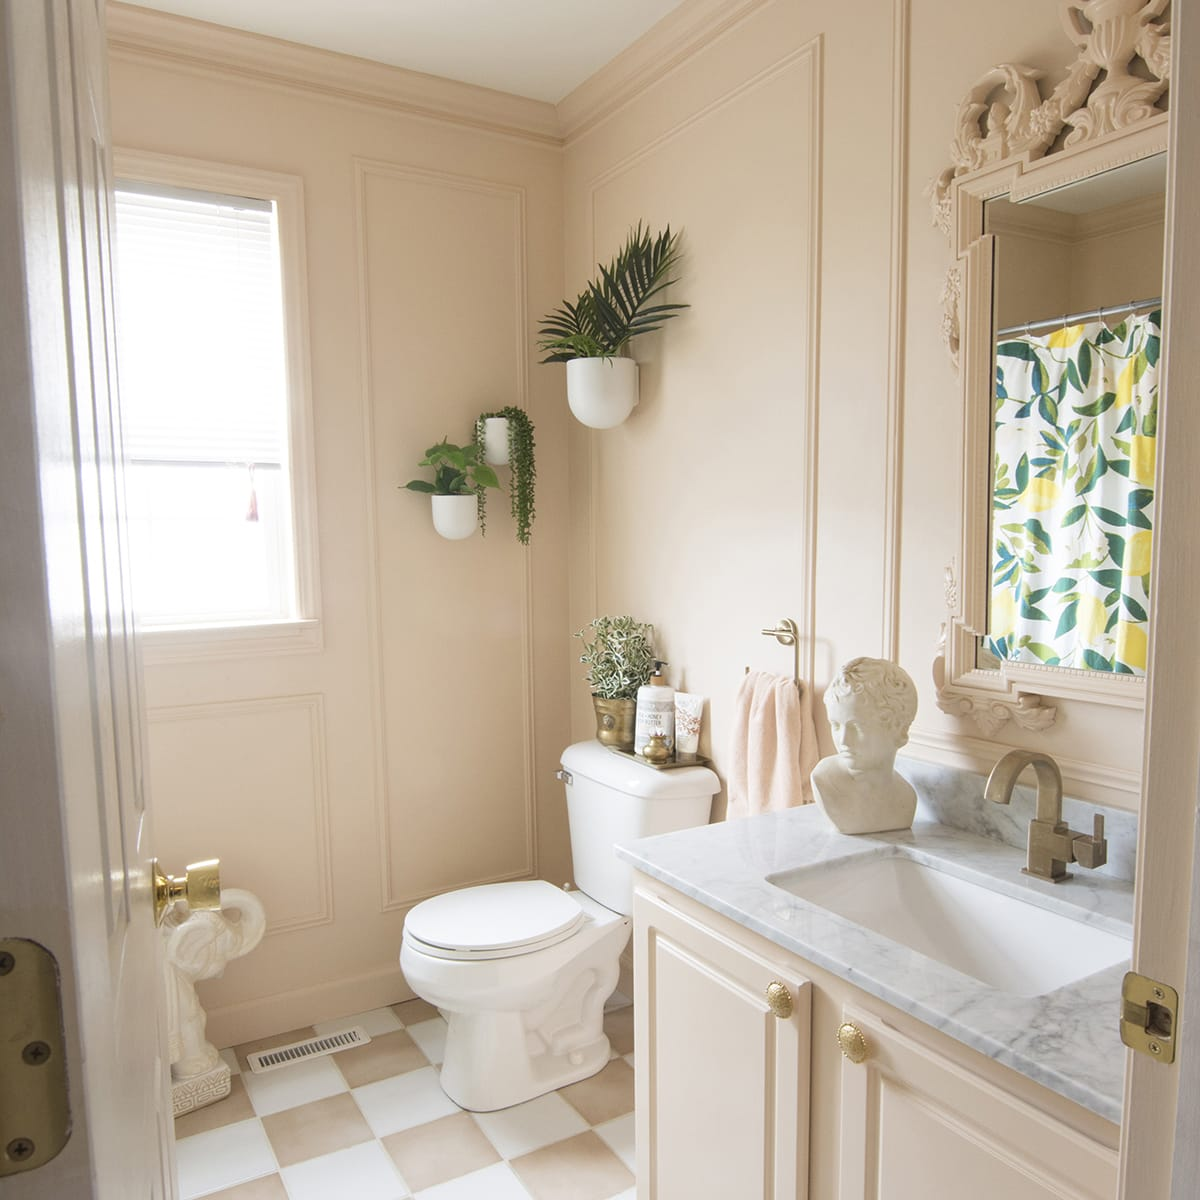 Blush and Marble, Vintage Inspired Budget Bathroom Remodel